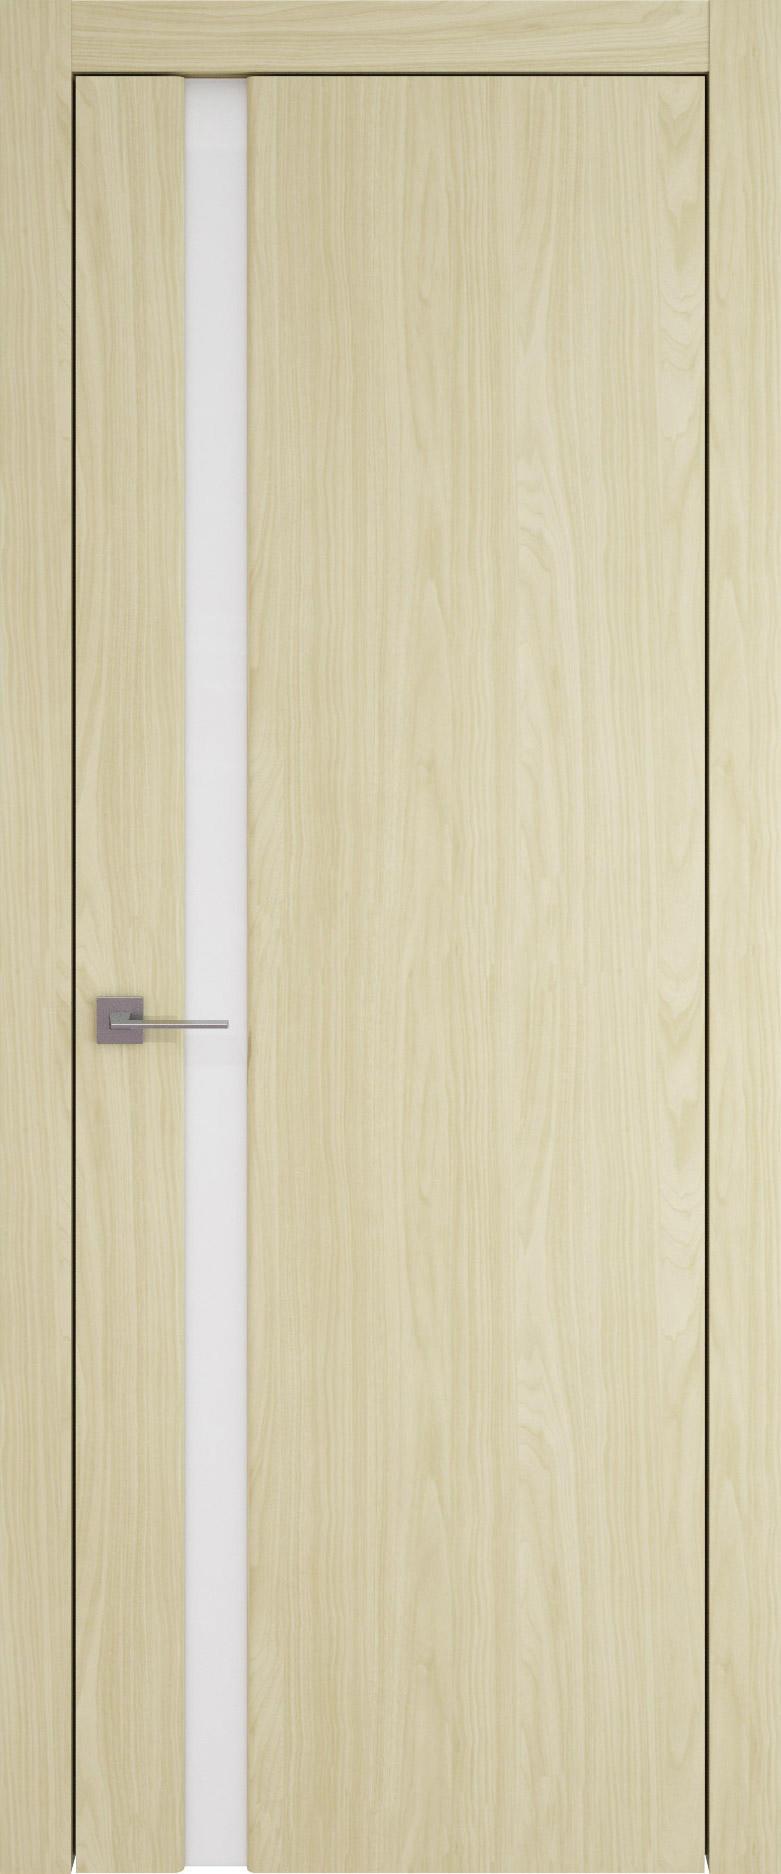 Torino цвет - Дуб нордик Без стекла (ДГ)